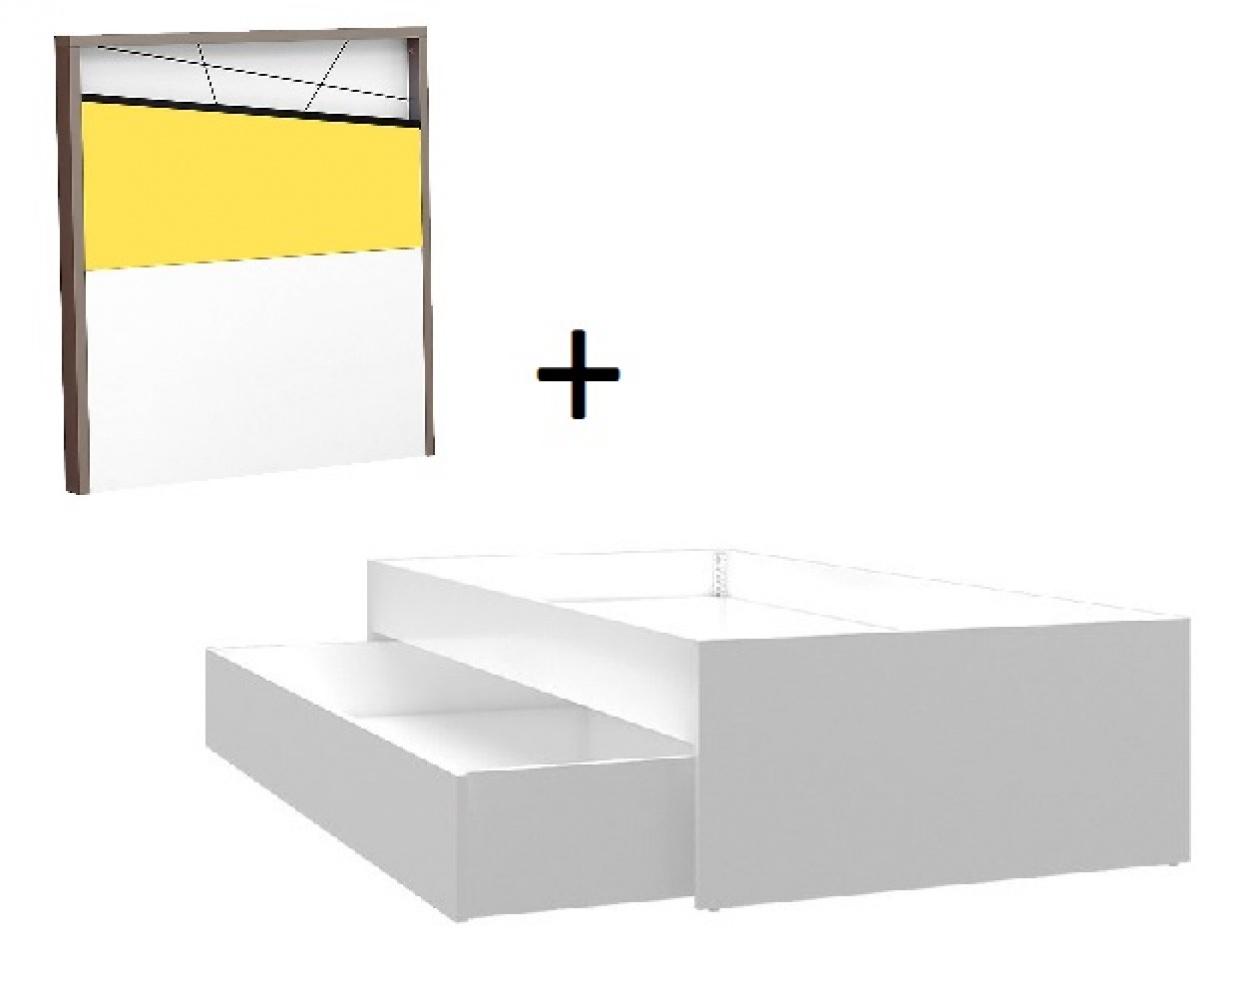 Almila Kinderbett mit Ausziehbett Angle in Weiß